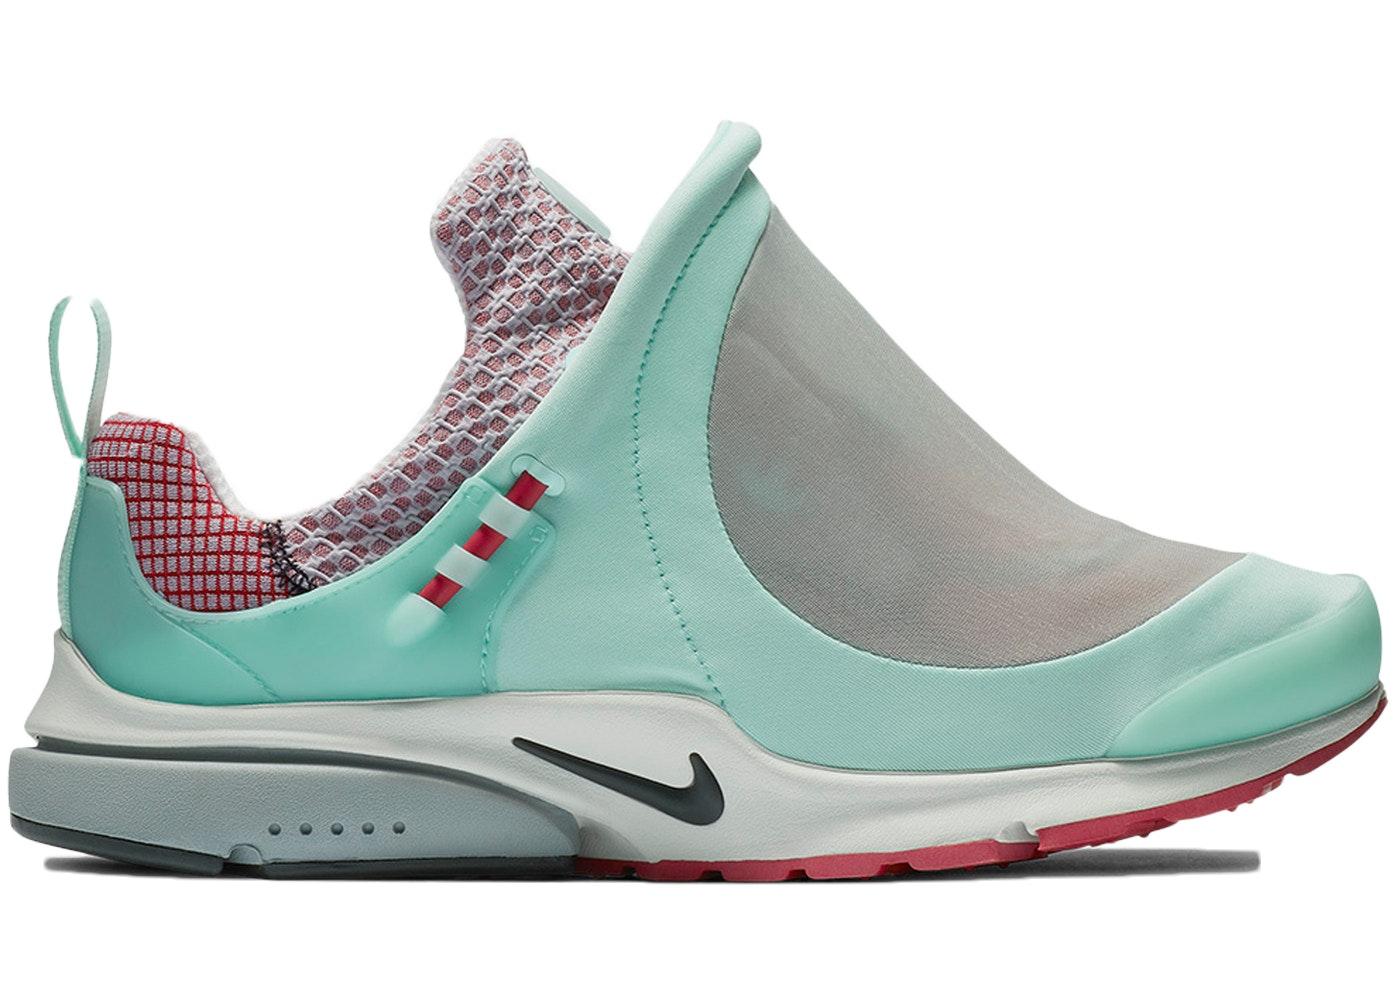 Nike Presto Foot Tent Comme des Garcons Skylight